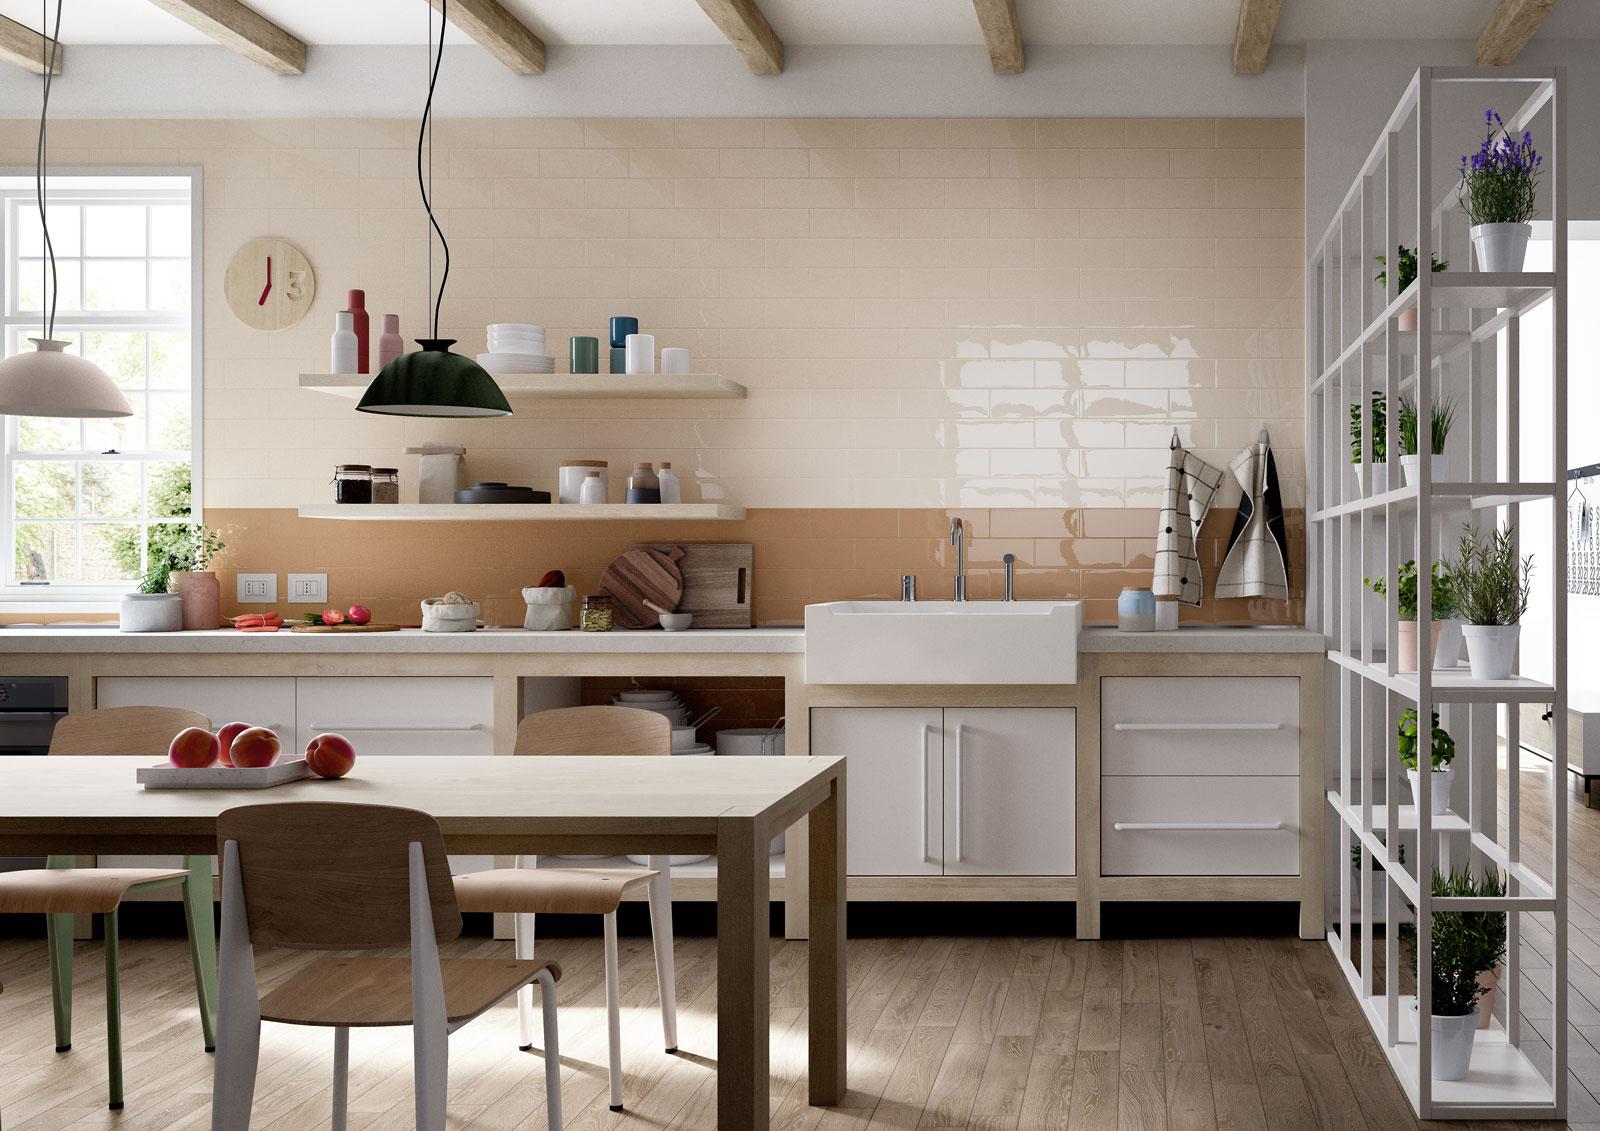 Mellow piastrelle ceramica da rivestimento marazzi for Piastrelle maiolica cucina